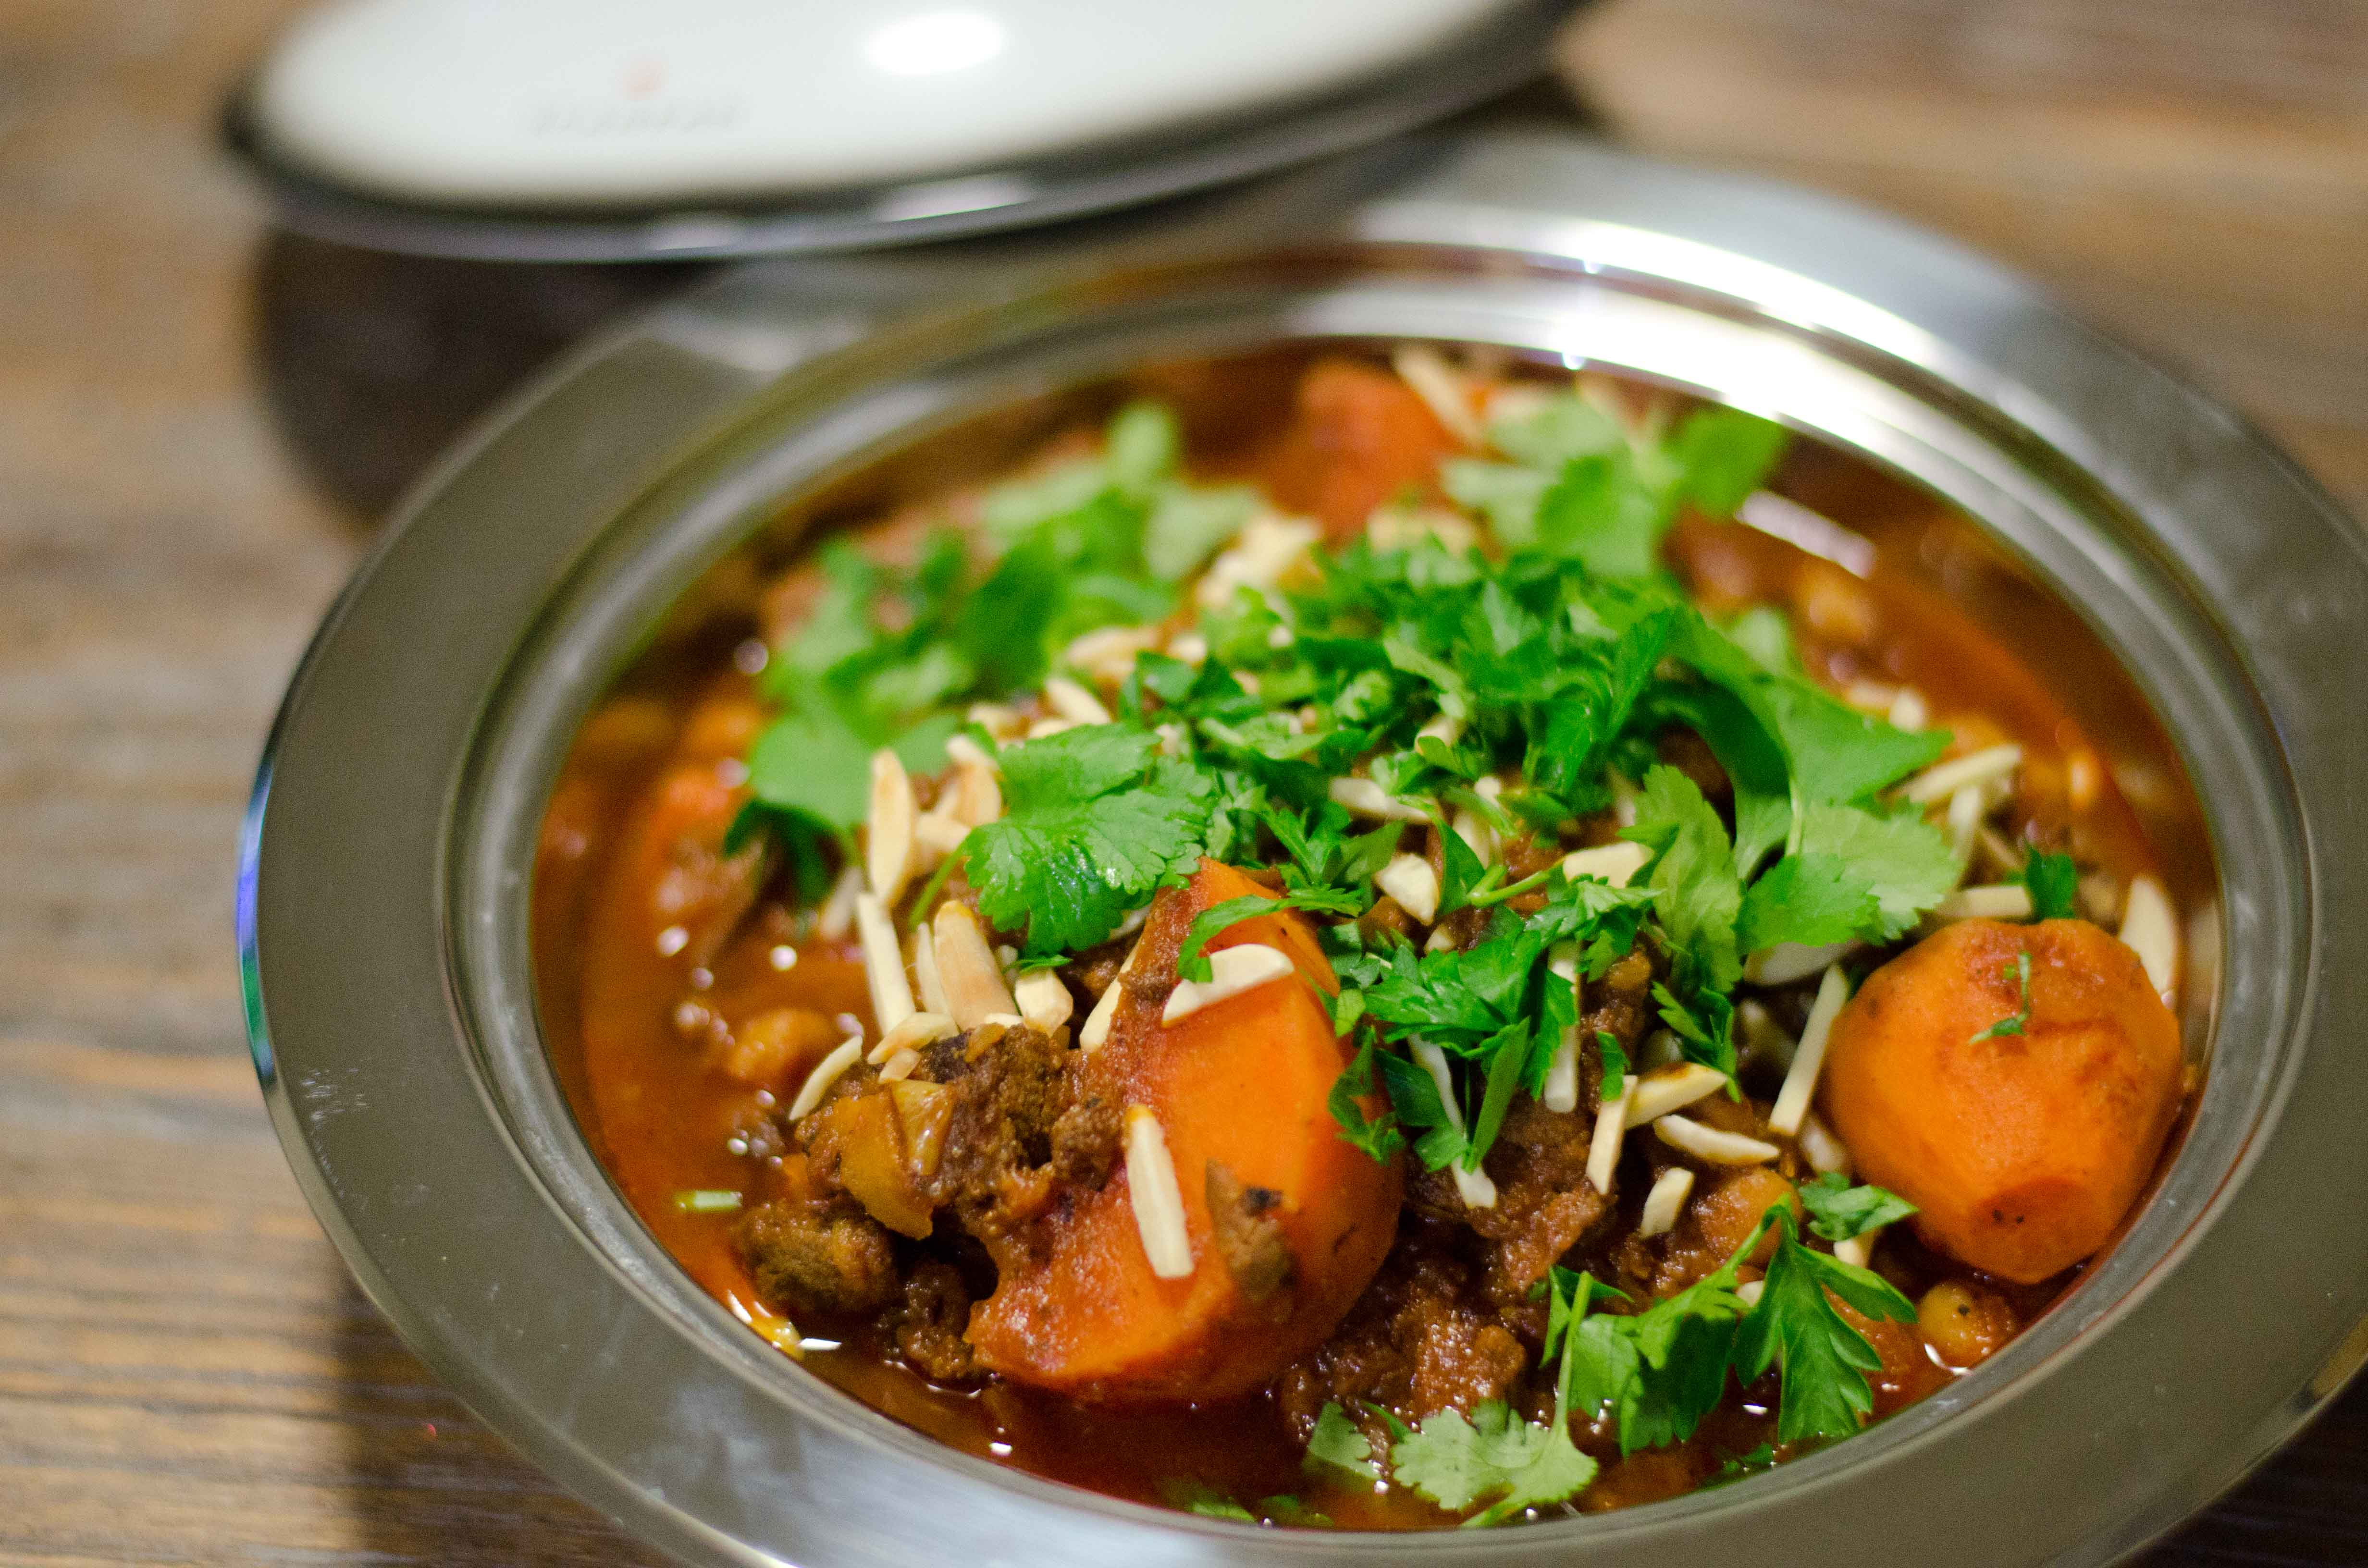 Scanpan Tagine Revew and a Beef Tagine Recipe